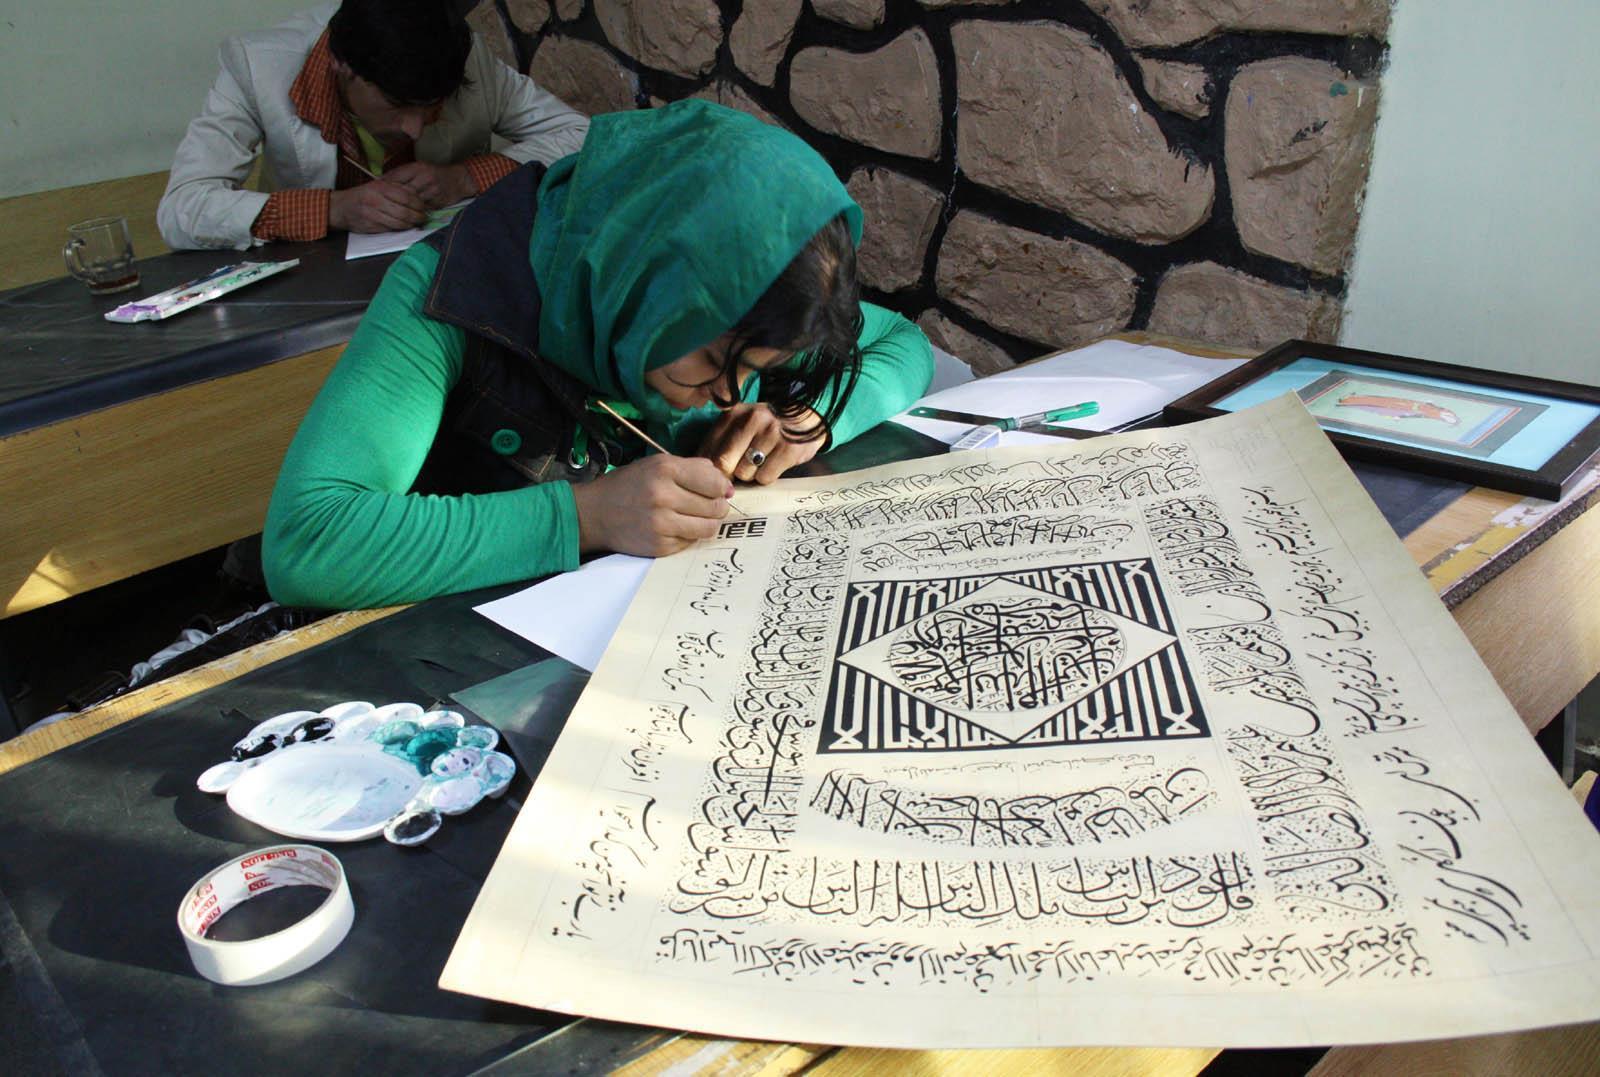 a girl working on afghan calligraphy